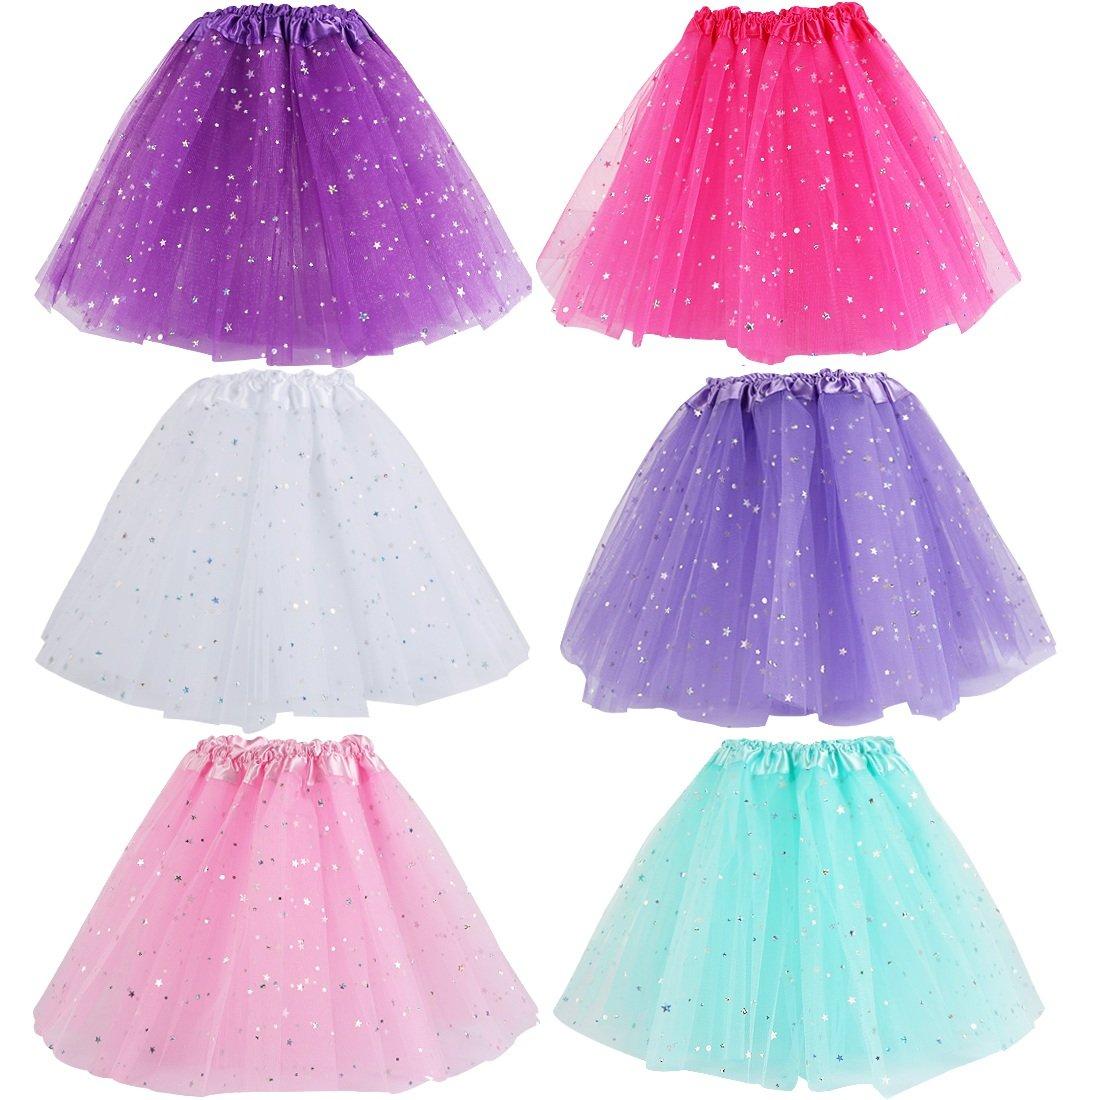 kilofly 6pc Girls Ballet Tutu Kids Birthday Princess Party Favor Dress Skirt Set TRTAZ11A